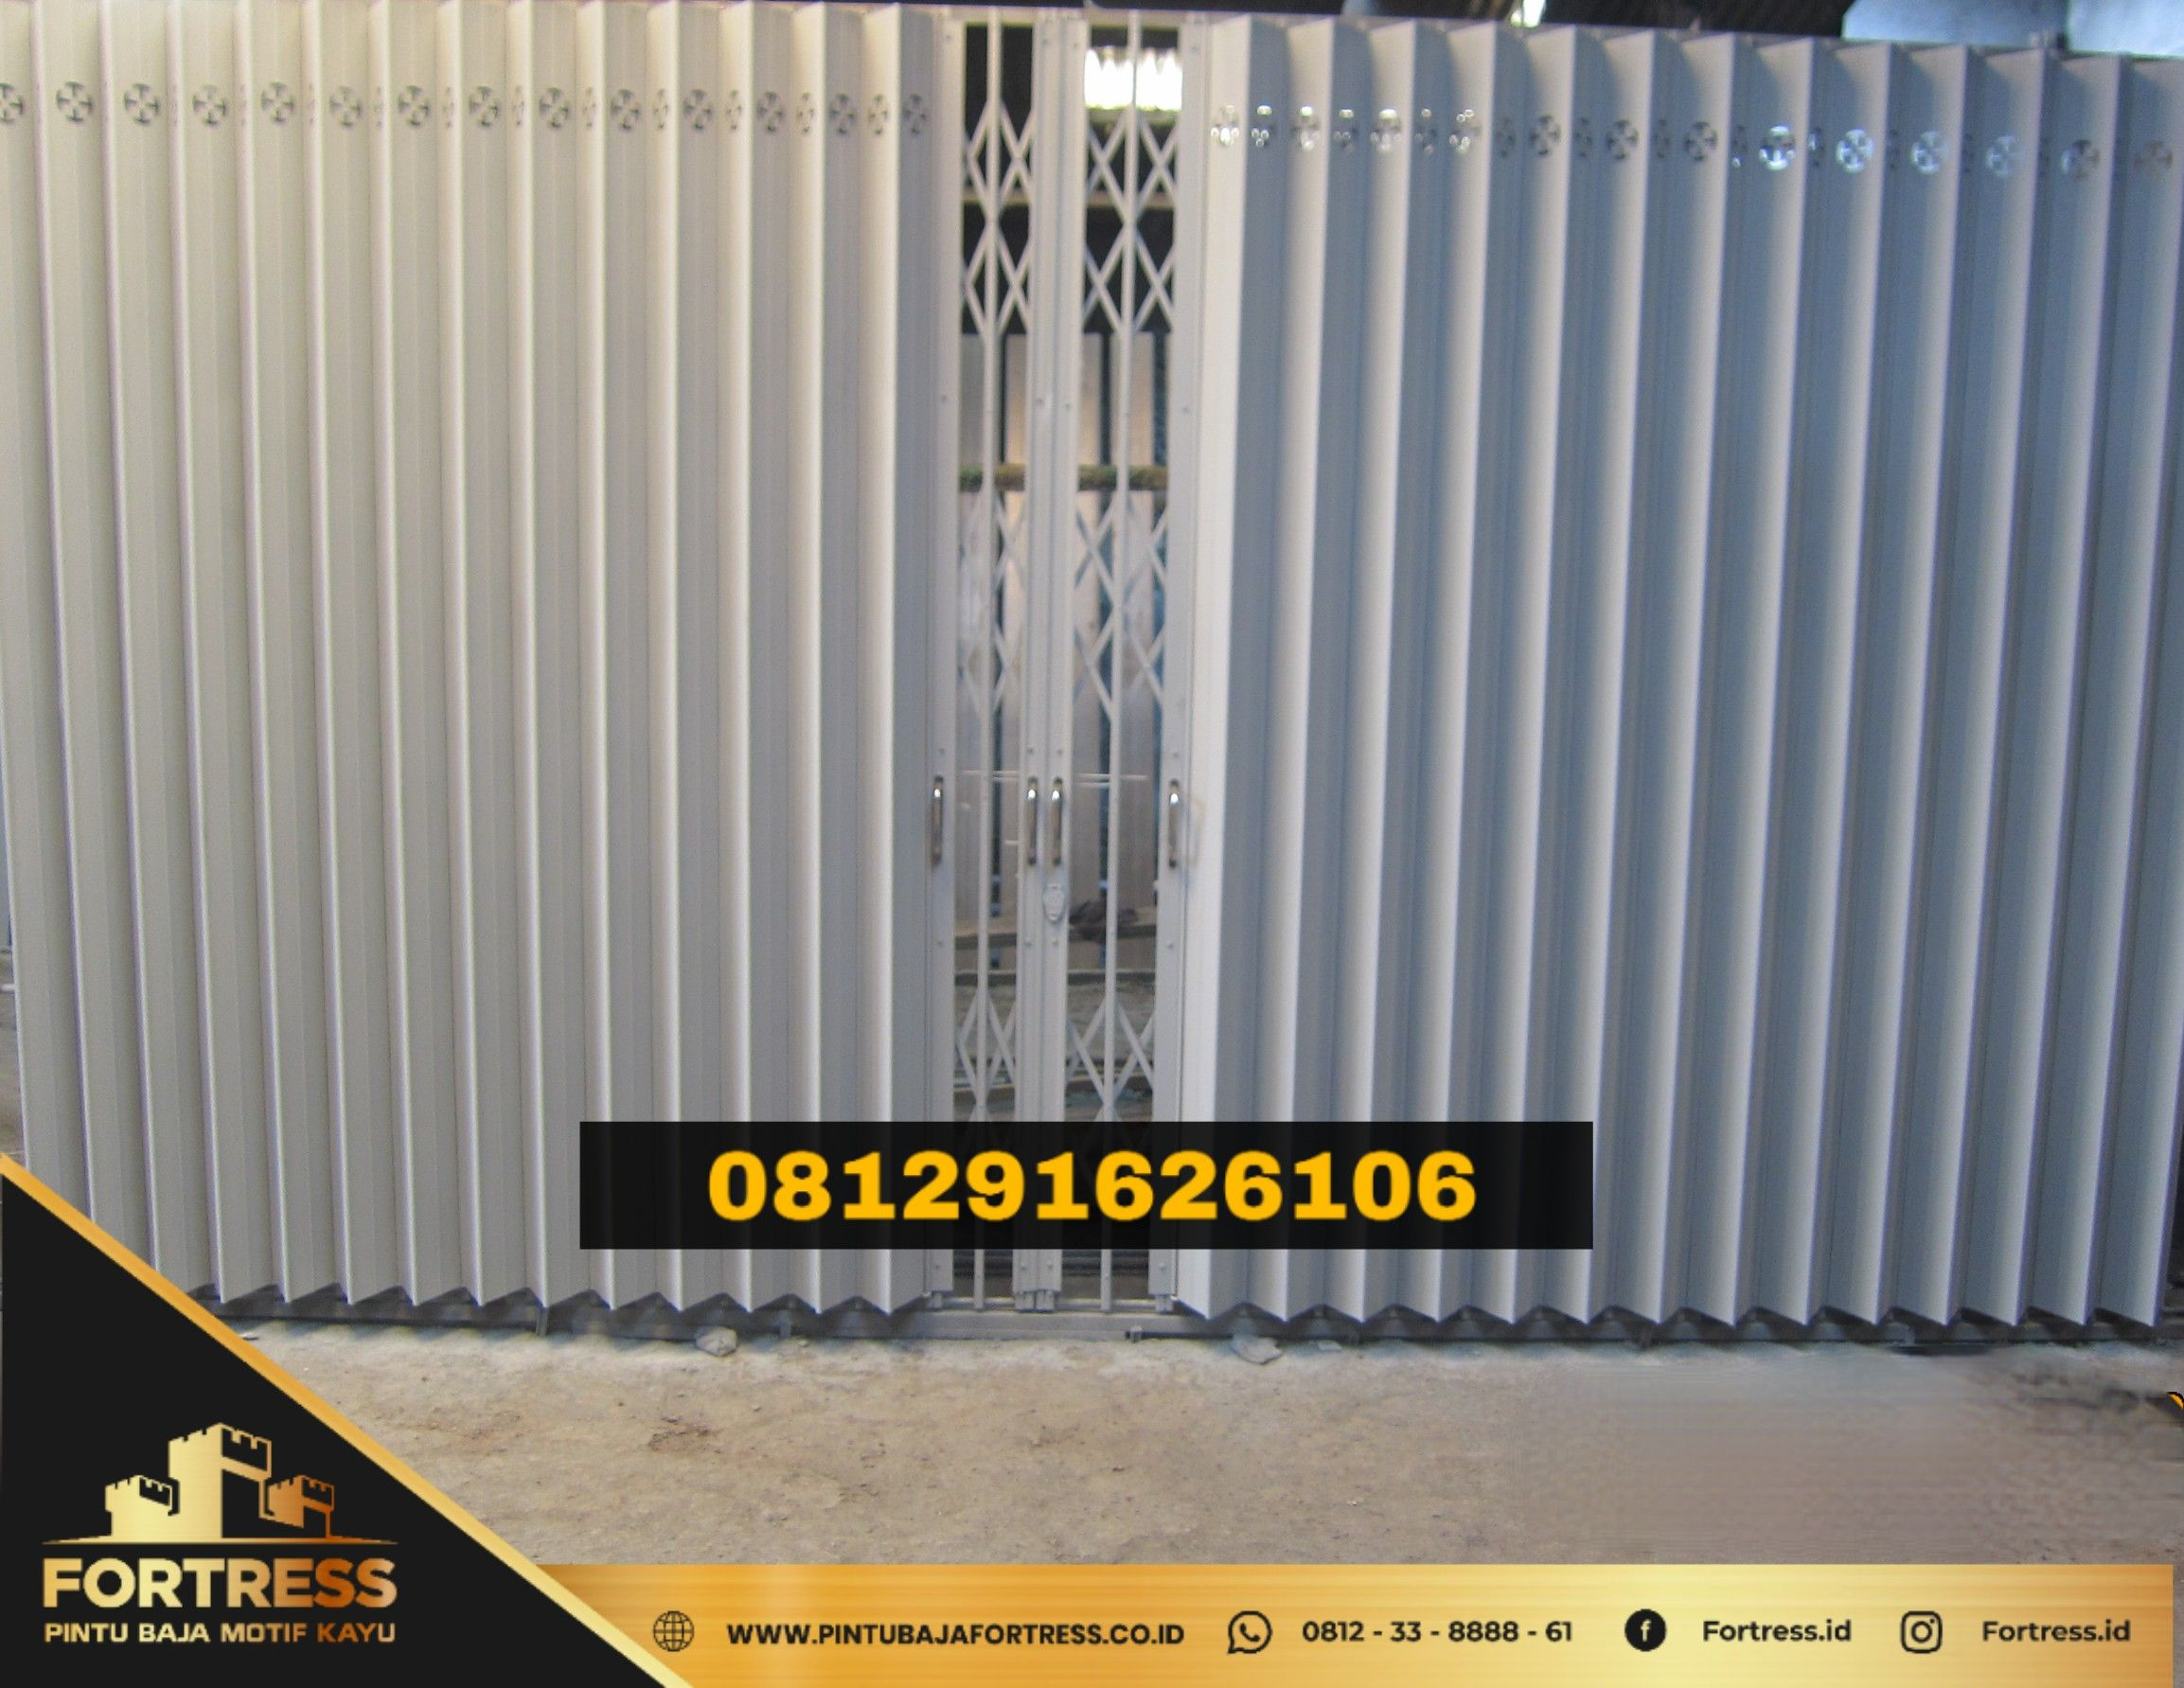 0812-3388-8861 (FORTRESS), Price of Folding Gate Blitar Tangsel …